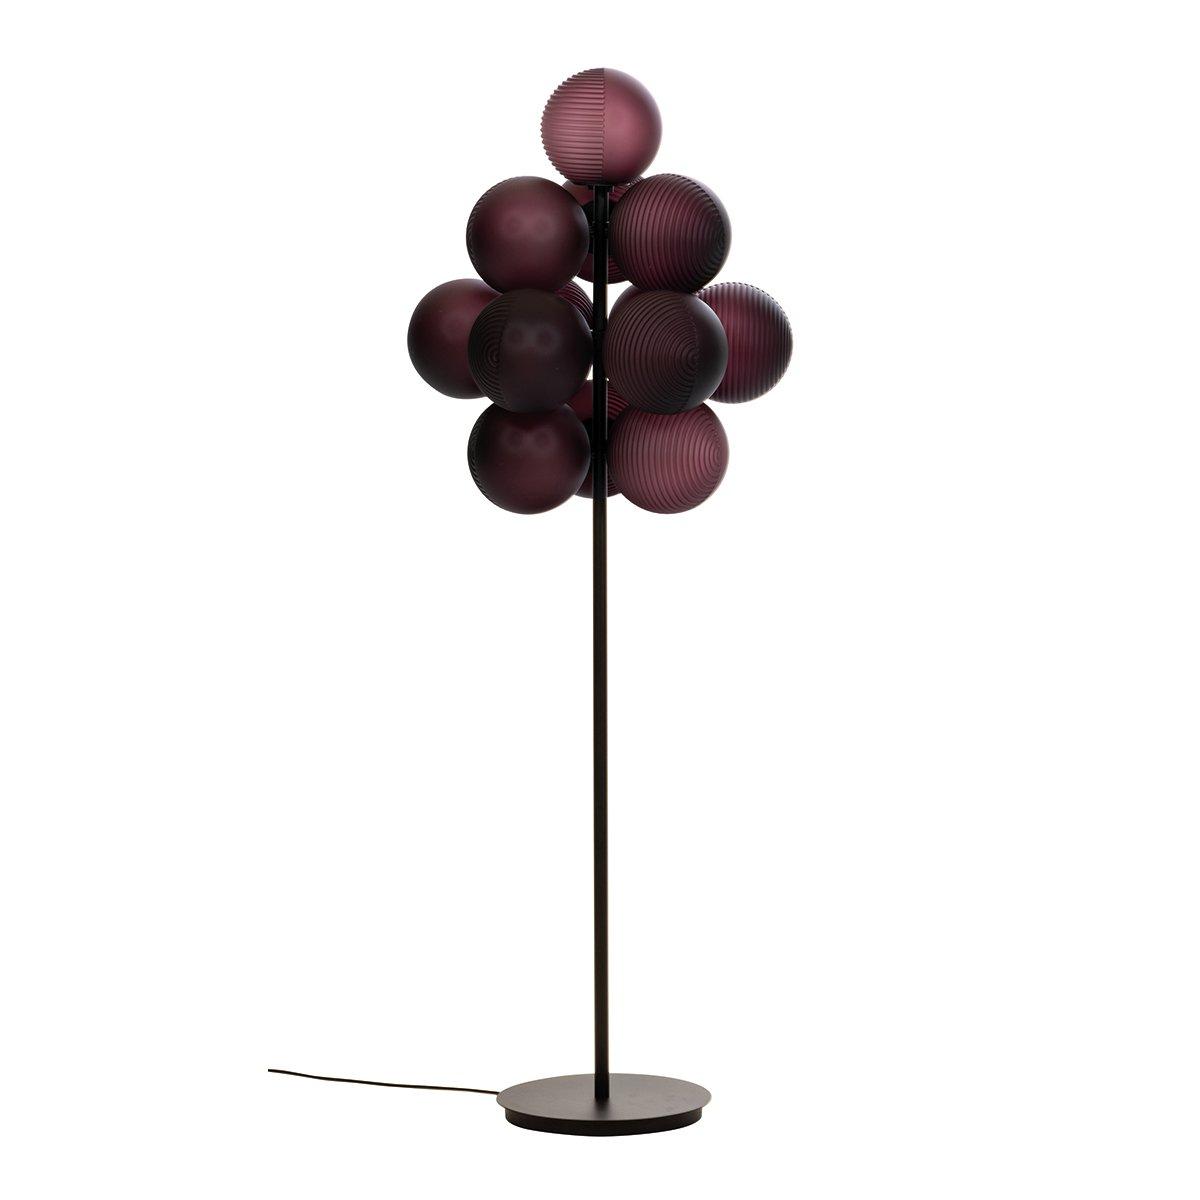 Pulpo Stellar Grape Vloerlamp Big by Sebastian Herkner - Aubergine